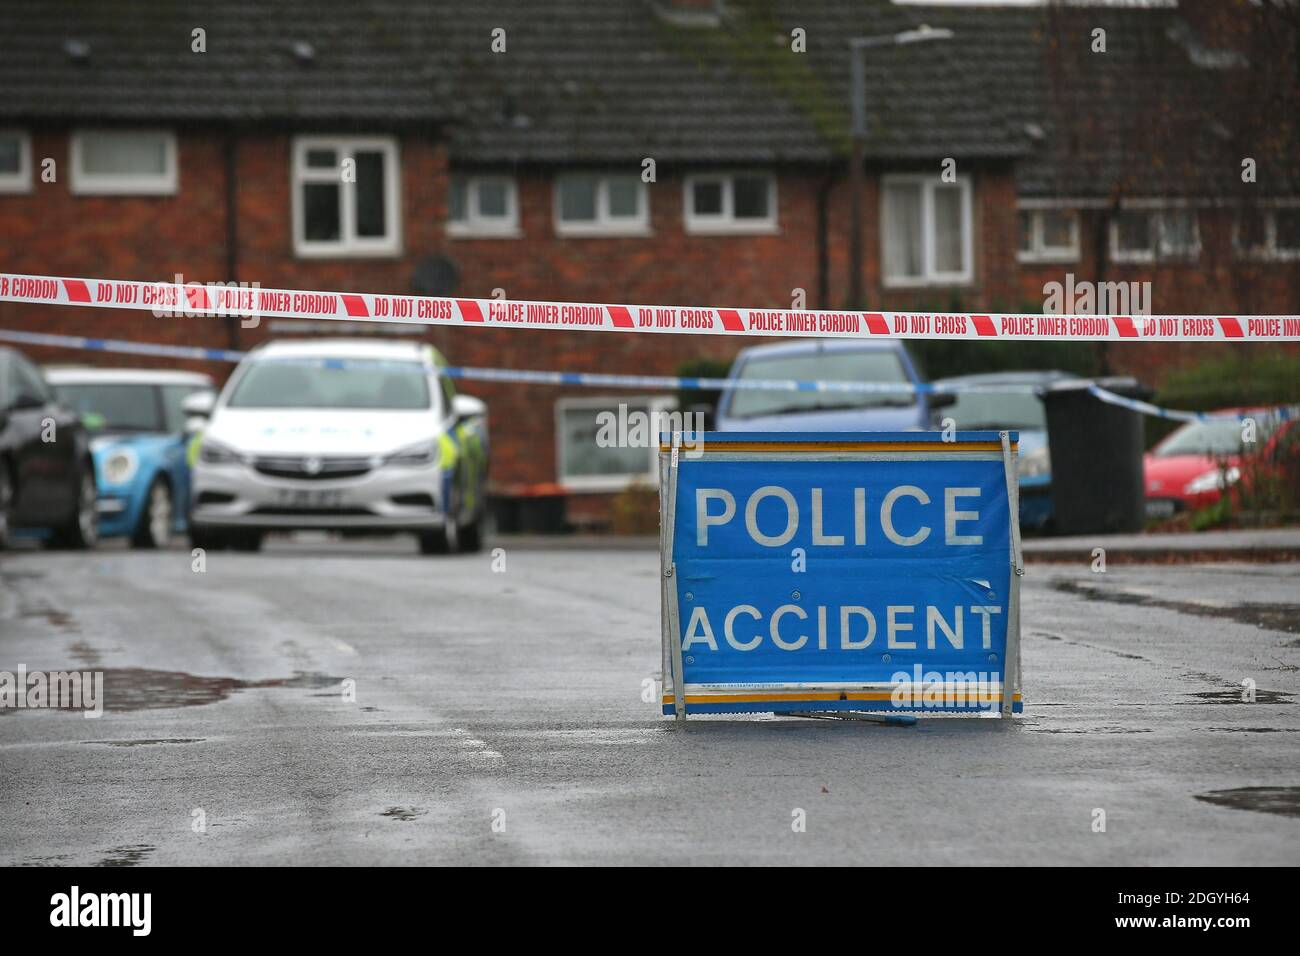 Signo de accidente policial, Nottingham, jueves 3 de diciembre de 2020. Foto de stock